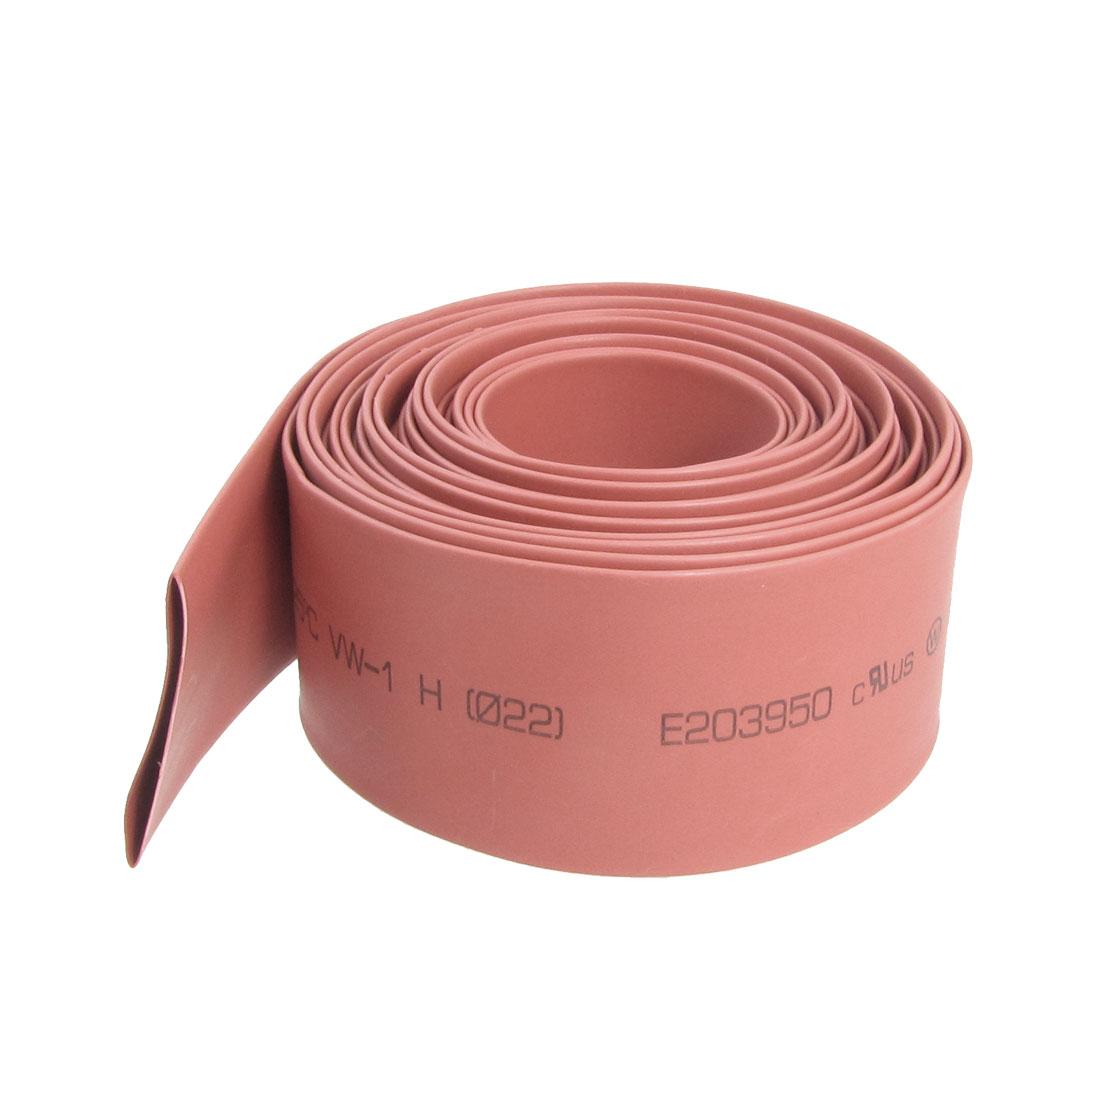 Ratio 2:1 22mm Dia. Red Heat Shrinkable Tube Shrinking Tubing 4M